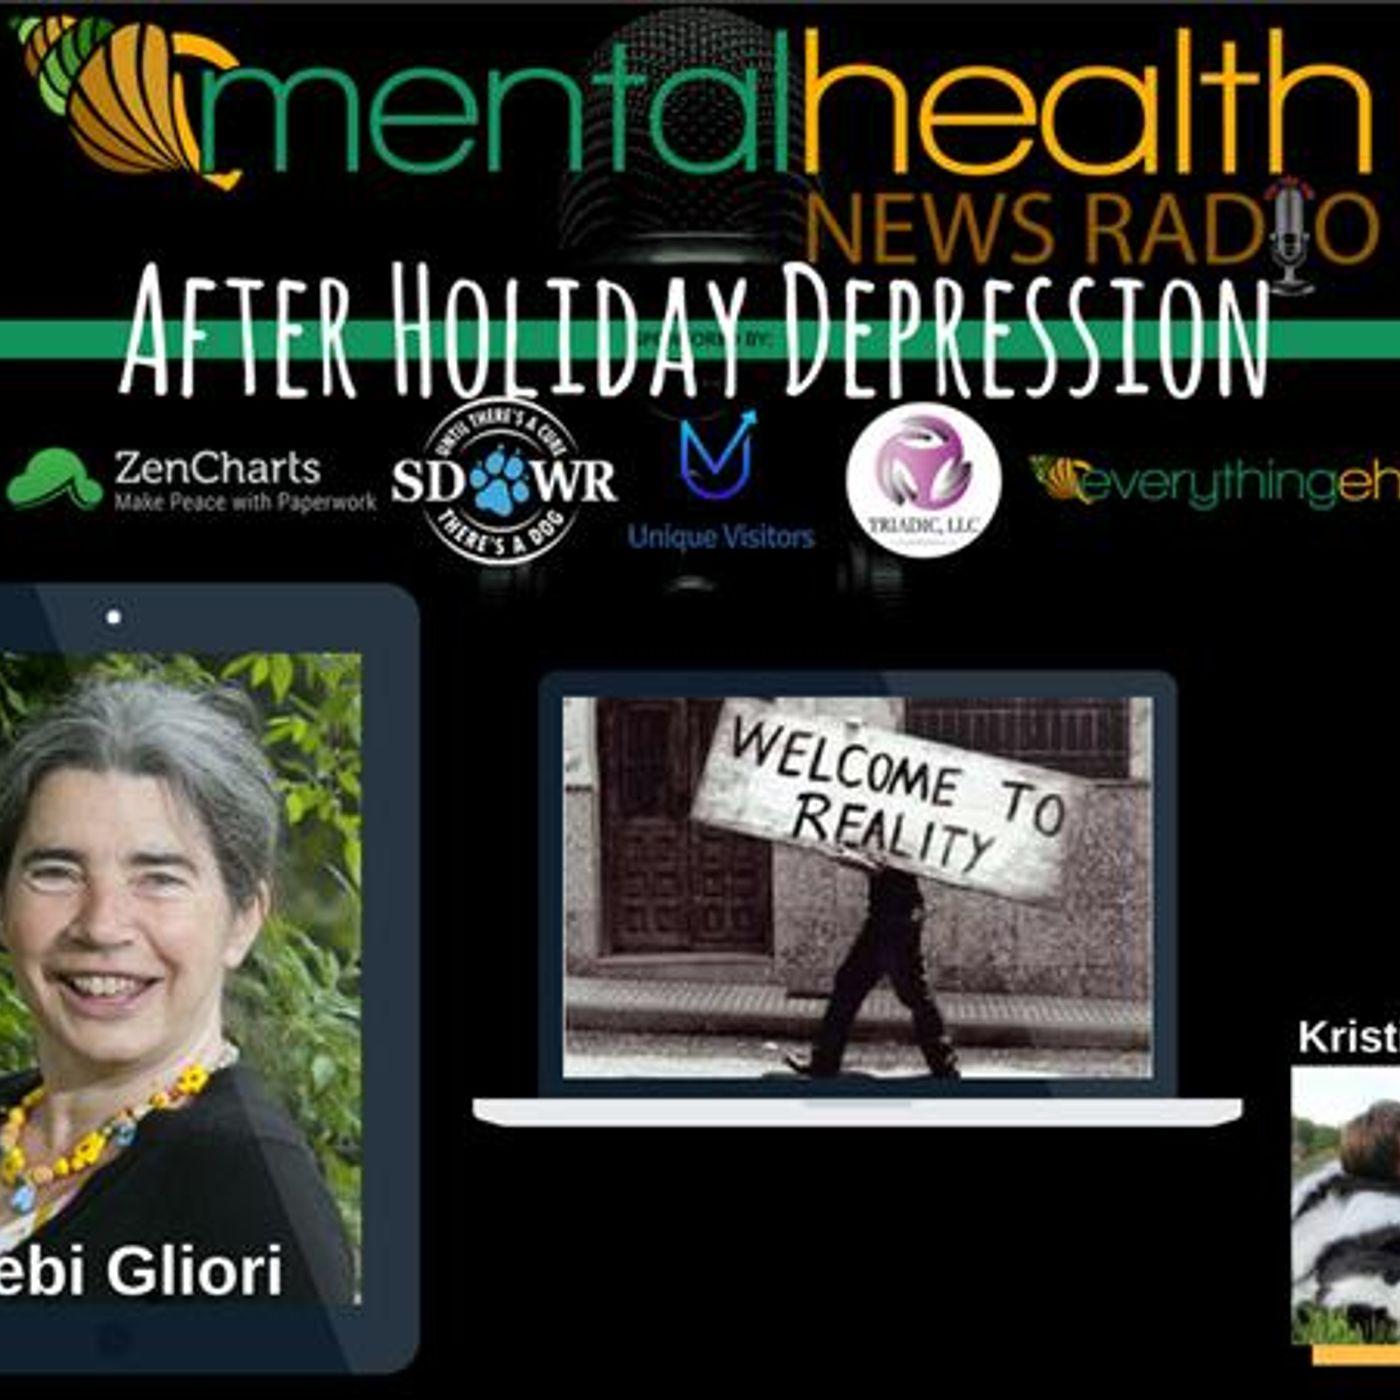 Mental Health News Radio - After Holiday Depression with Author Debi Gliori